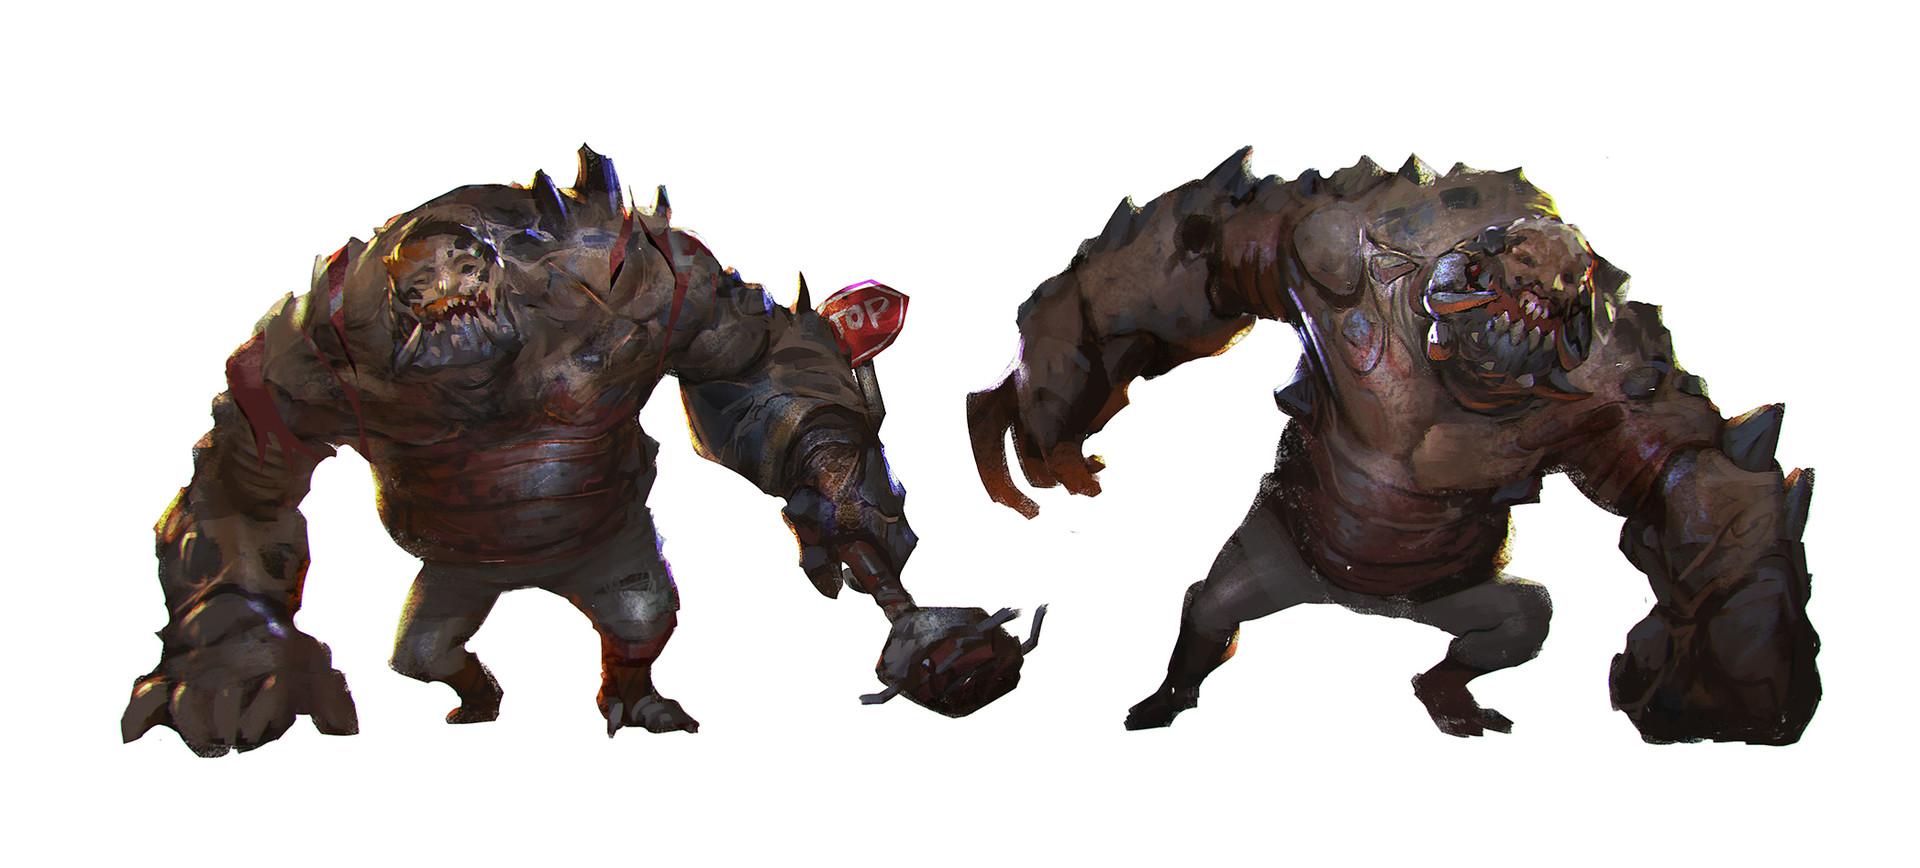 Rudy Siswanto - Mutant zombie sketches